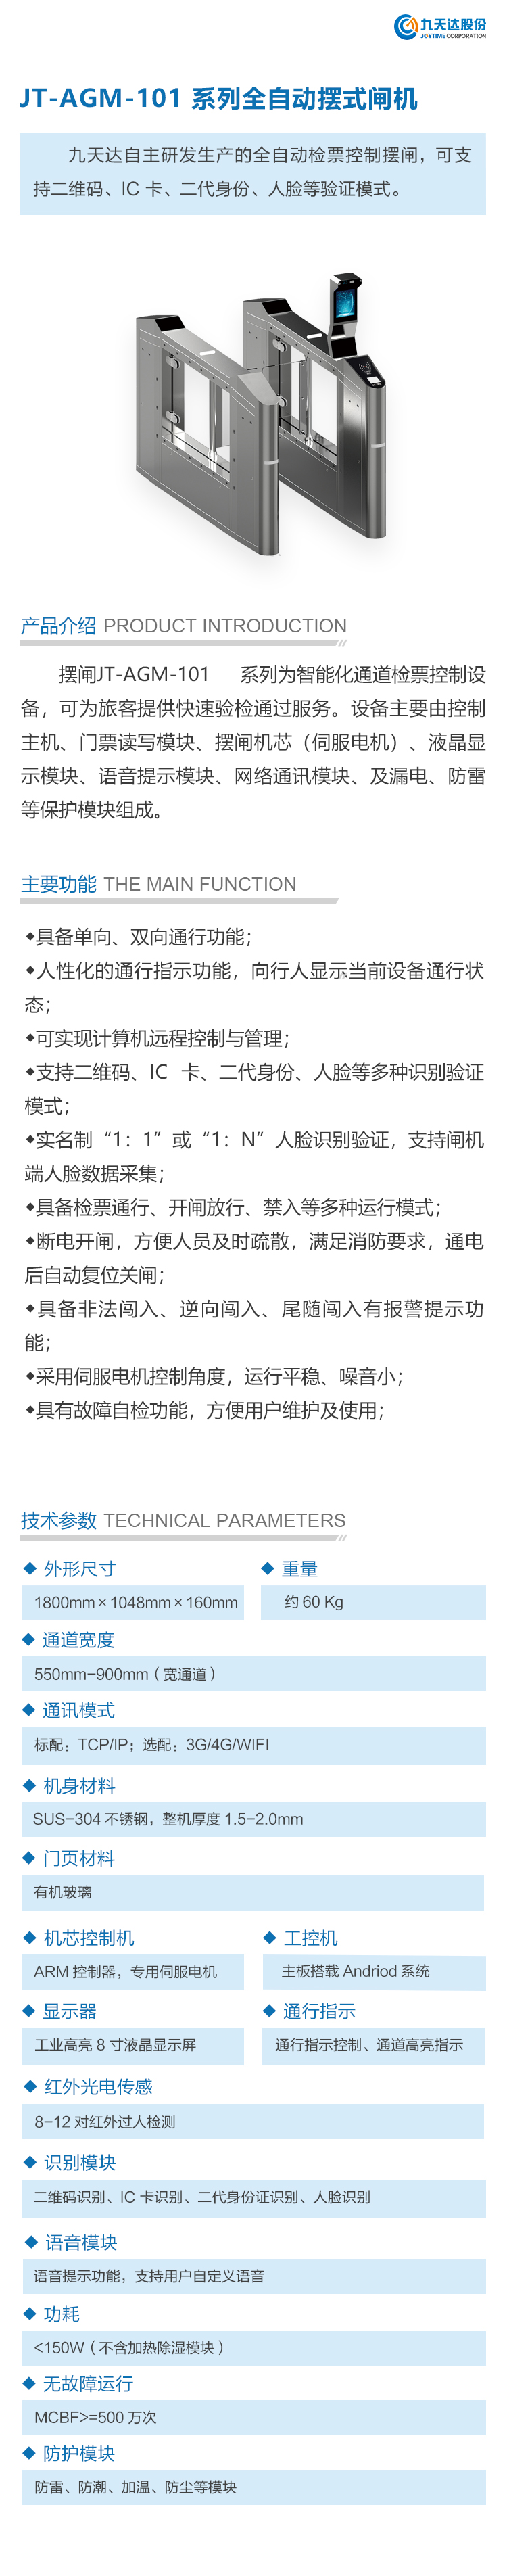 12781490_JT-AGM-101系列全自動擺式閘